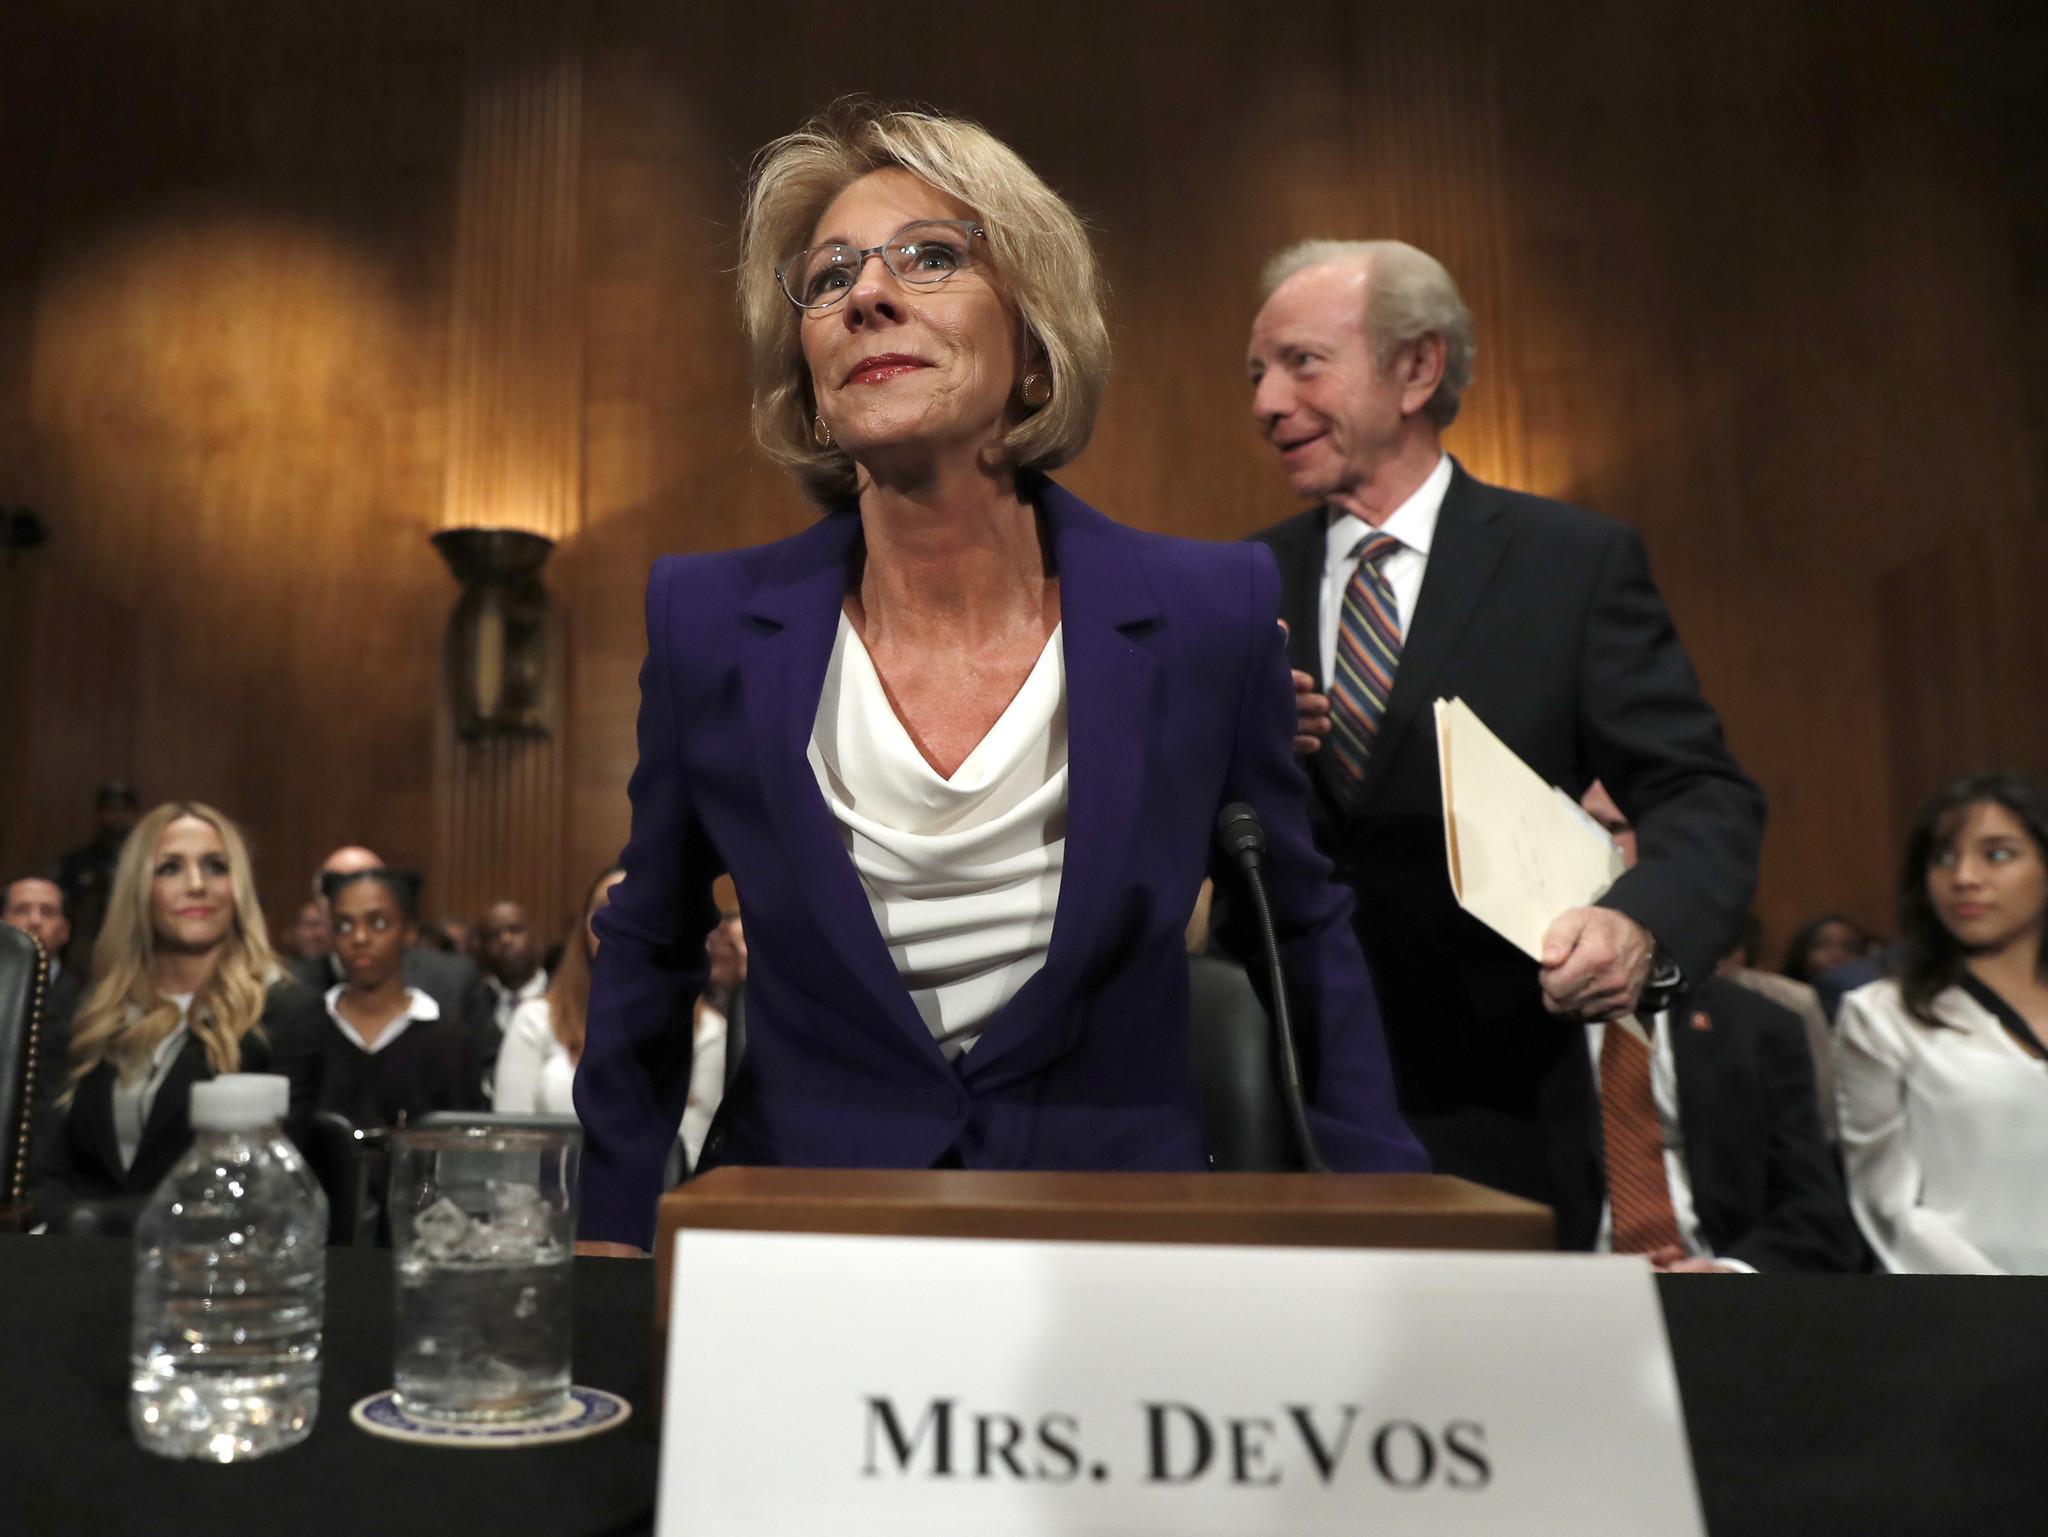 Education secretary pick betsy devos called bold reformer unfit